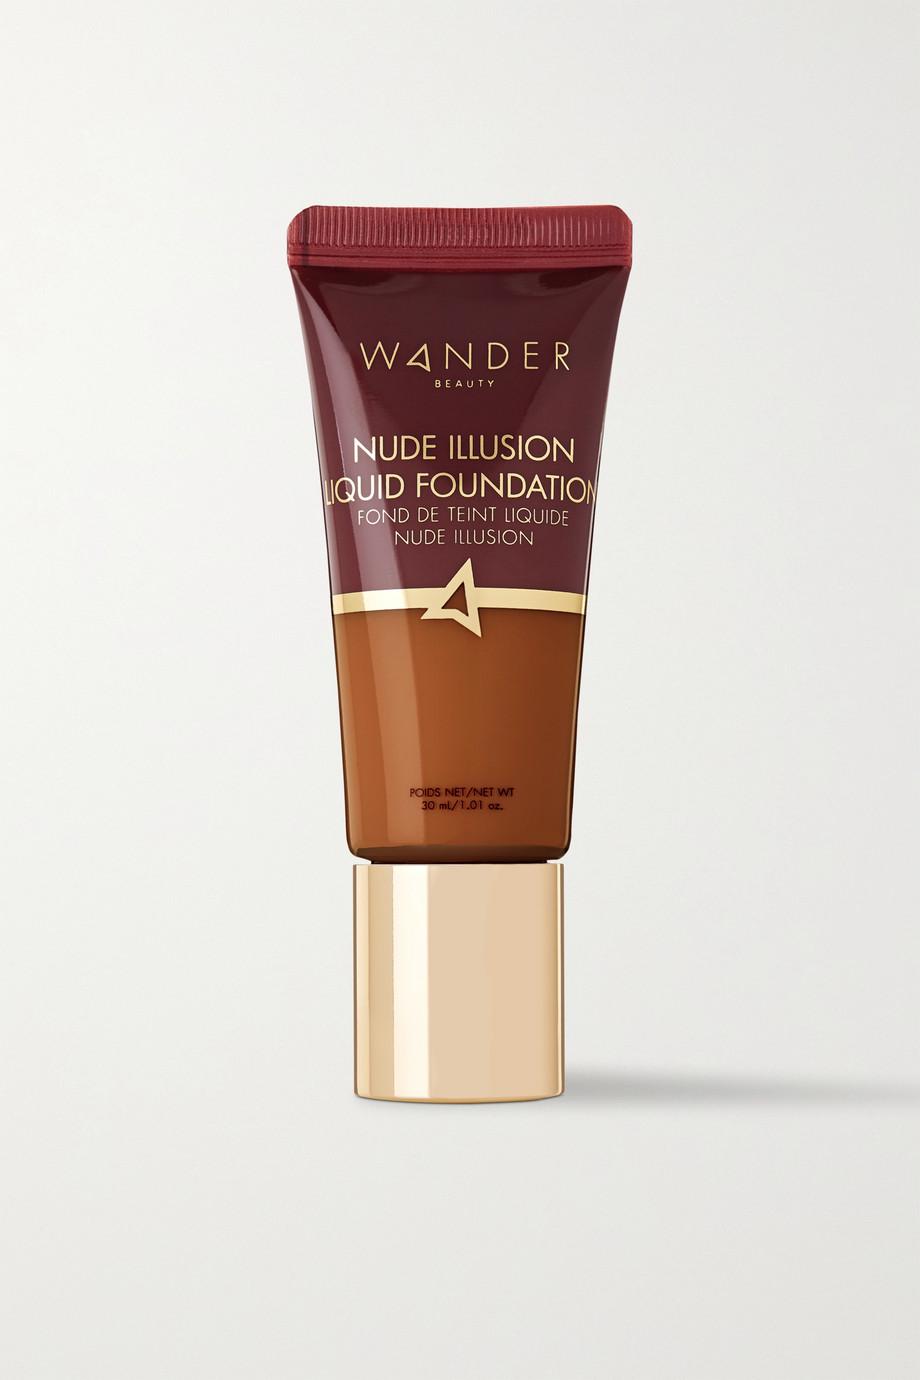 Wander Beauty Nude Illusion Liquid Foundation – Golden Rich – Foundation